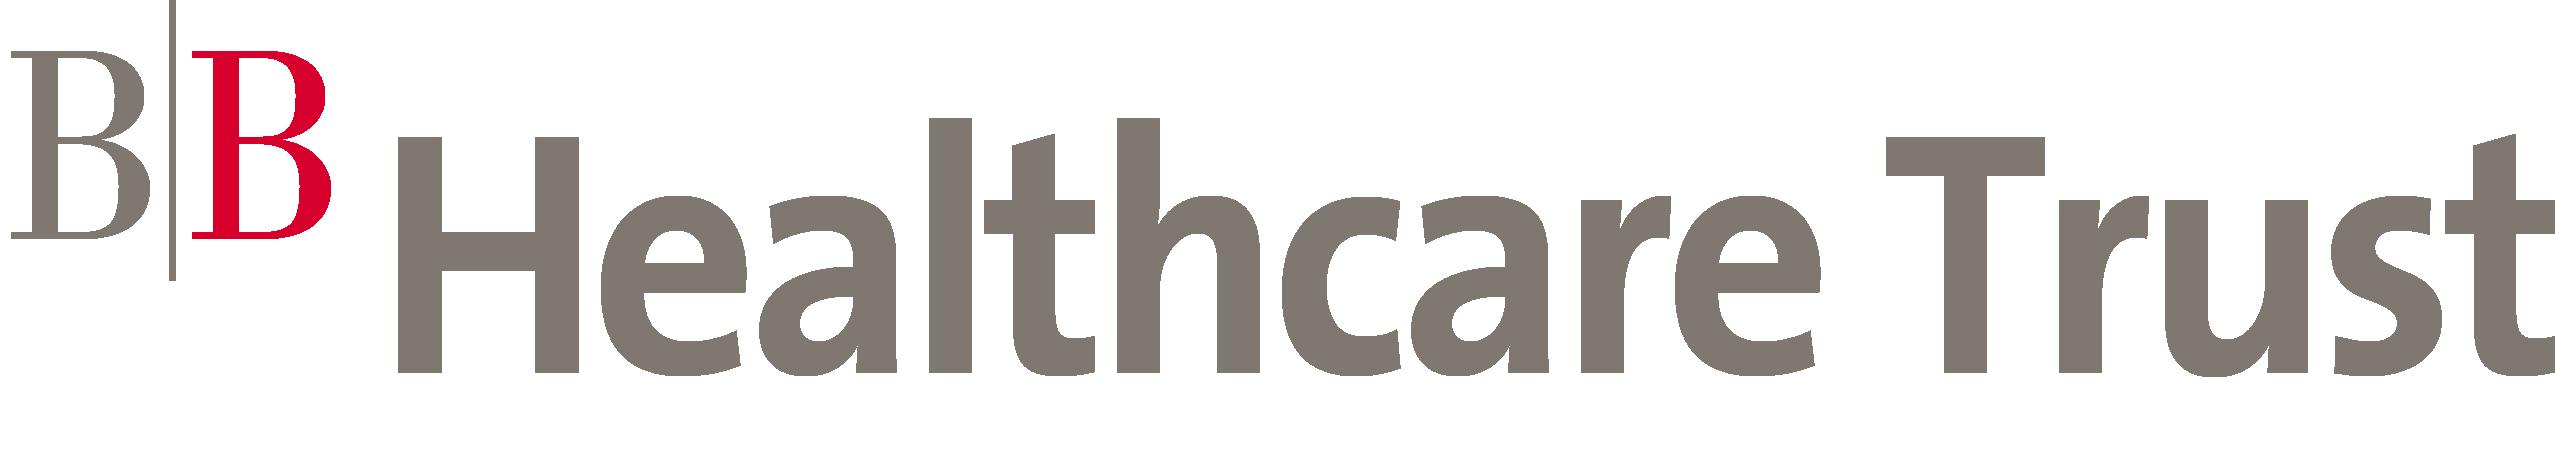 BB Healthcare Trust Plc